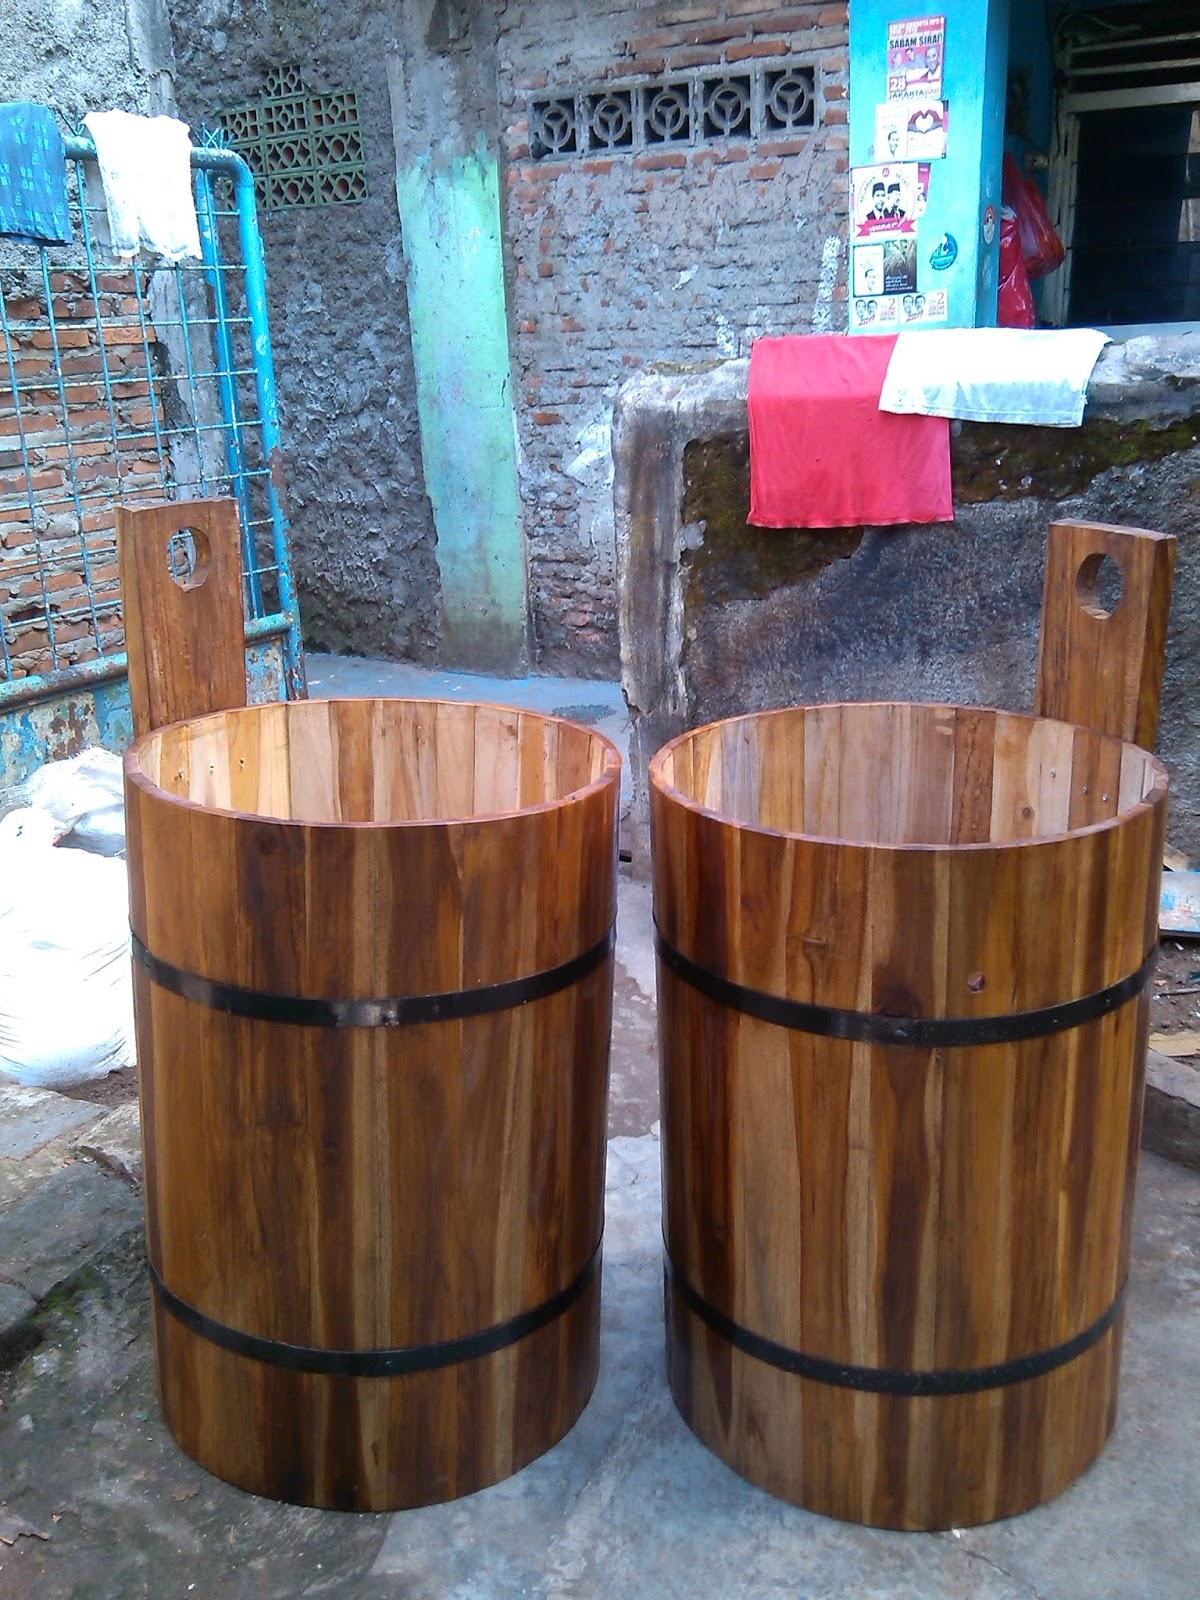 Penjual ember kayu gentong kayu barrel tahang 2020